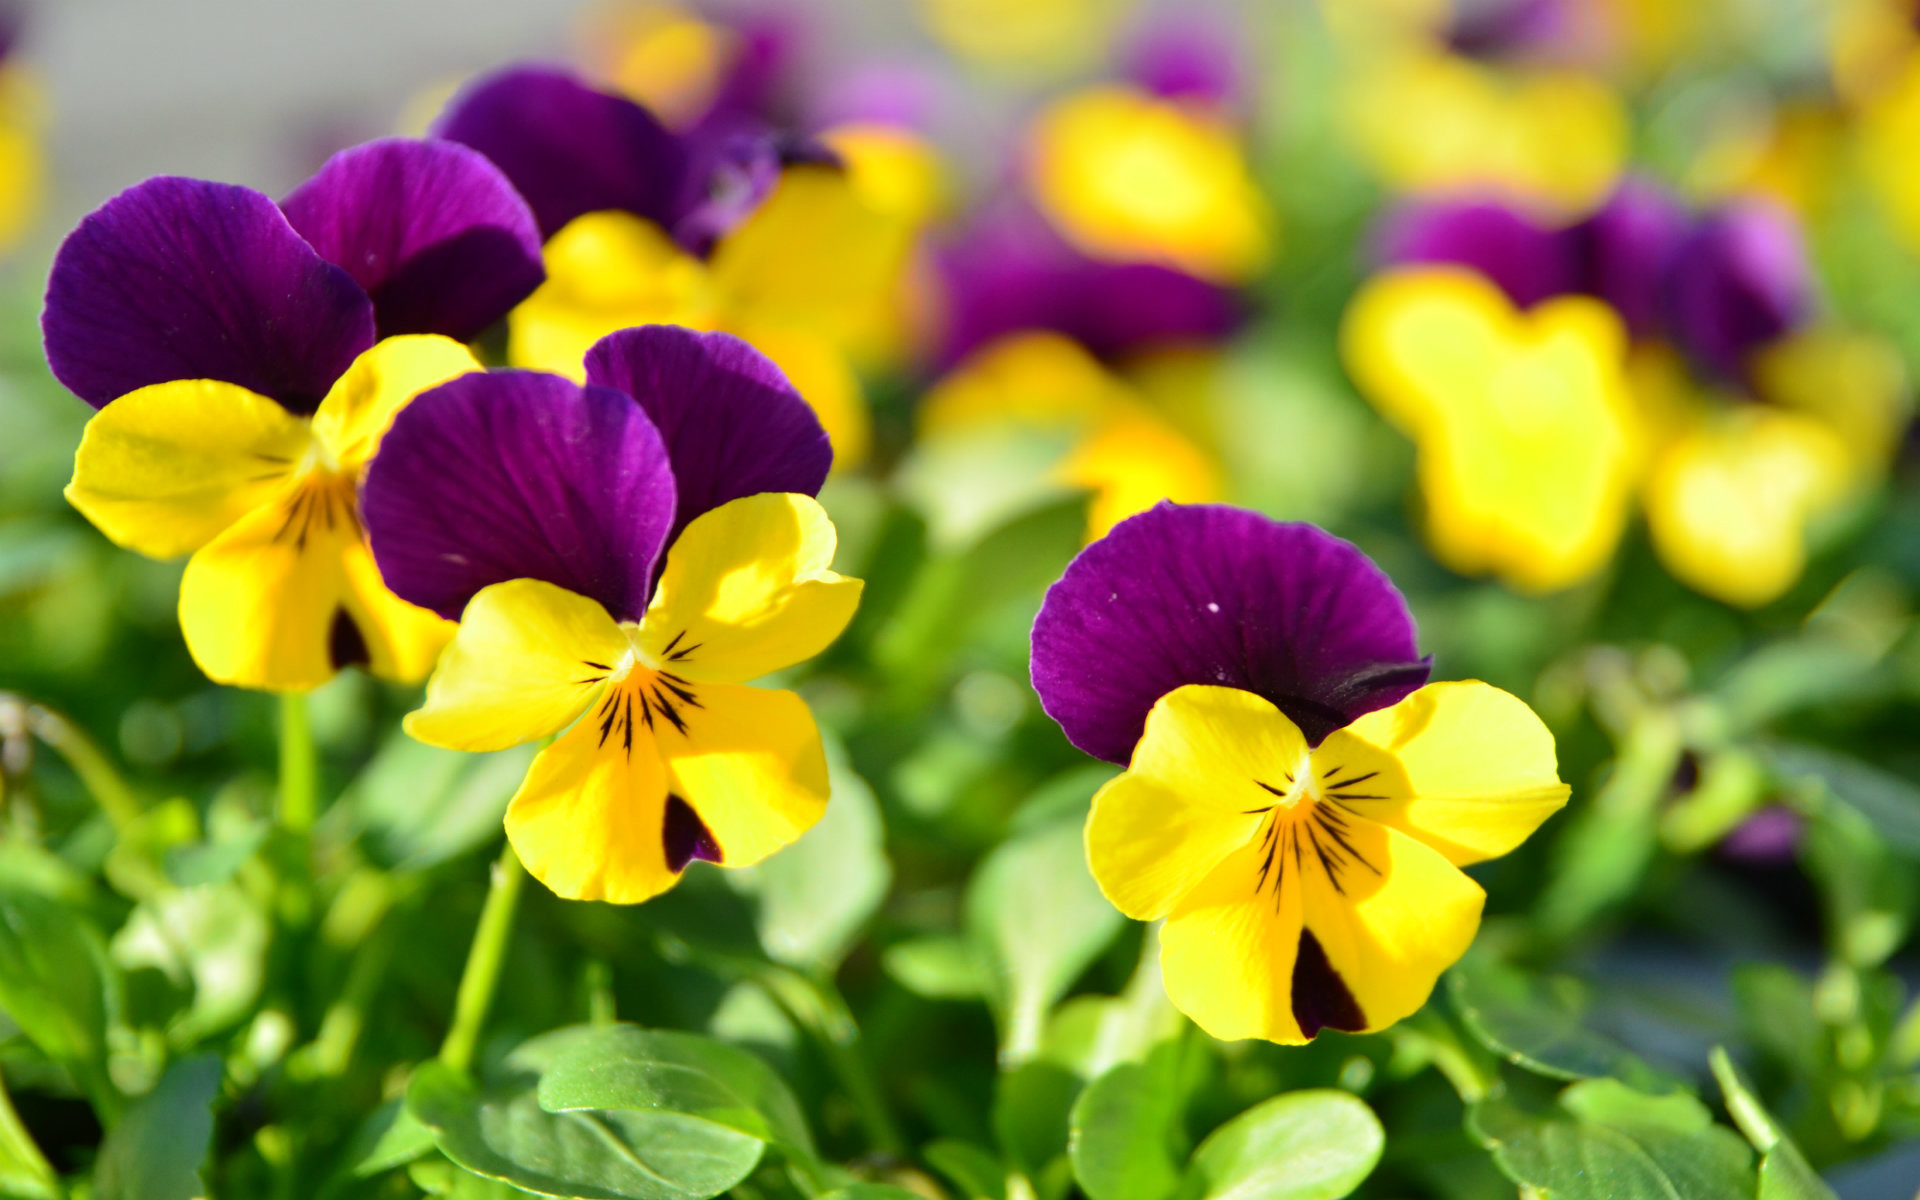 Pictures of beautiful flowers wallpapers 56 images 1920x1200 free download most beautiful flowers wallpaper izmirmasajfo